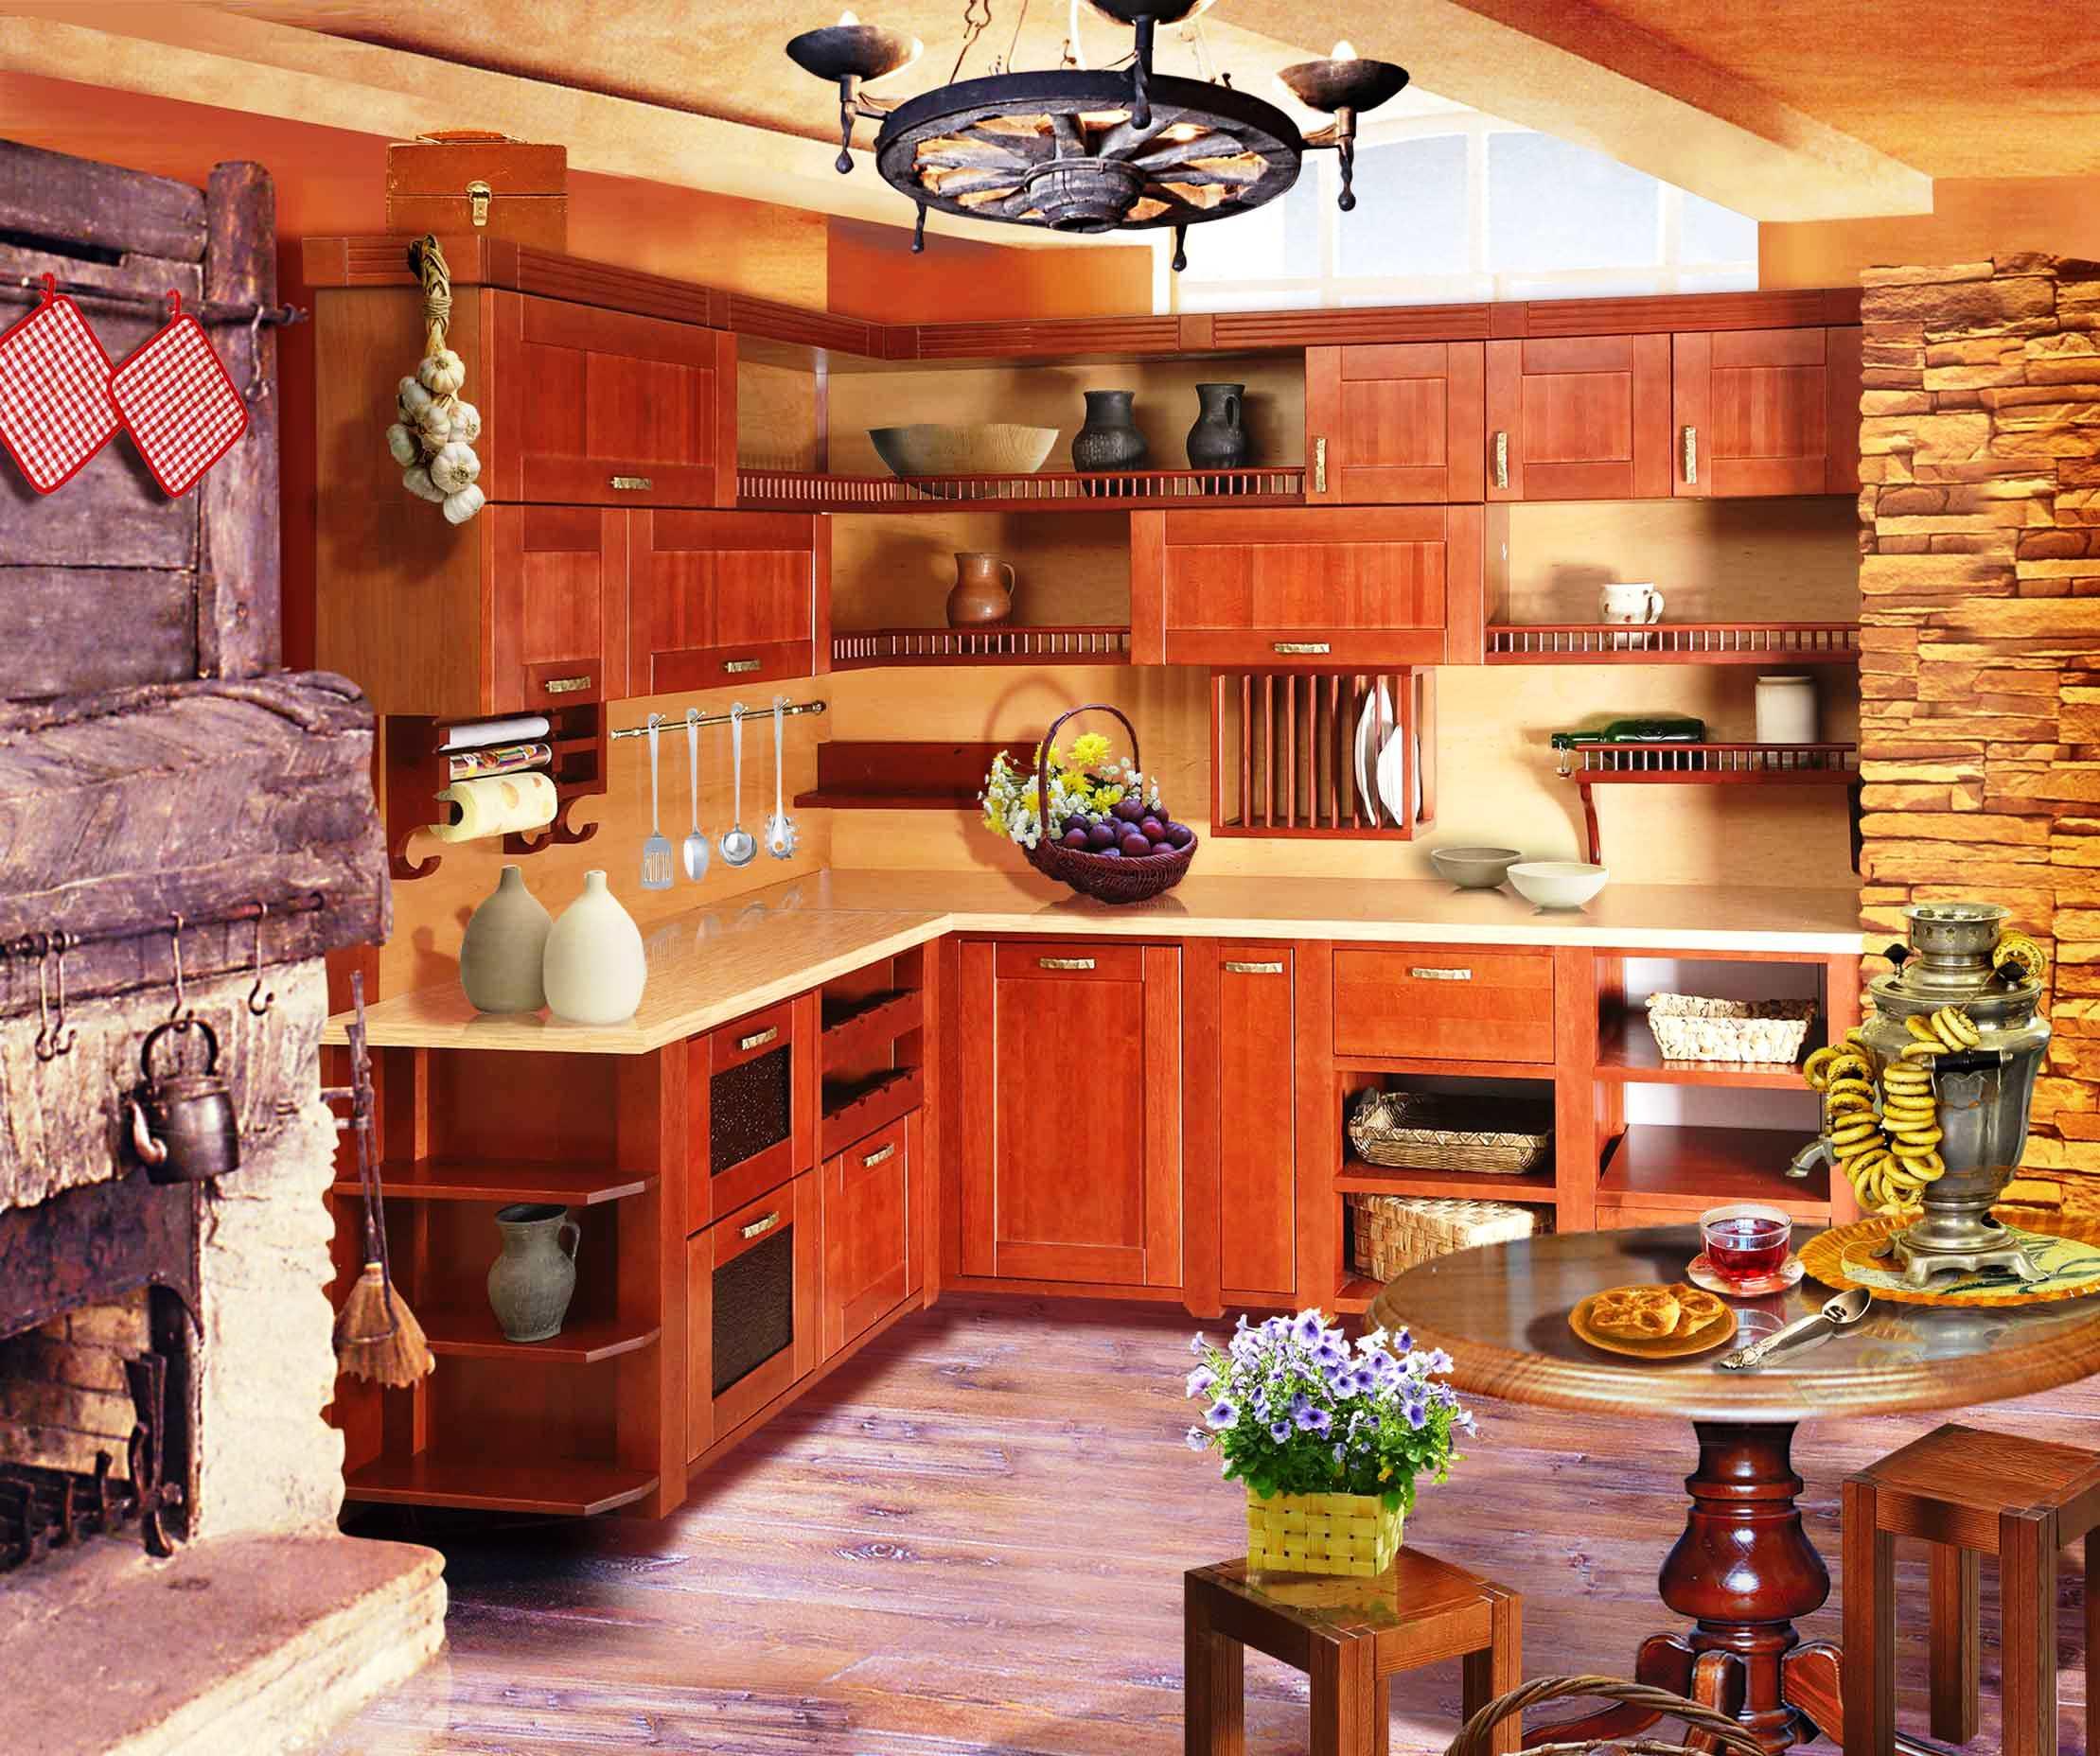 Кухонная мебель на даче своими руками фото